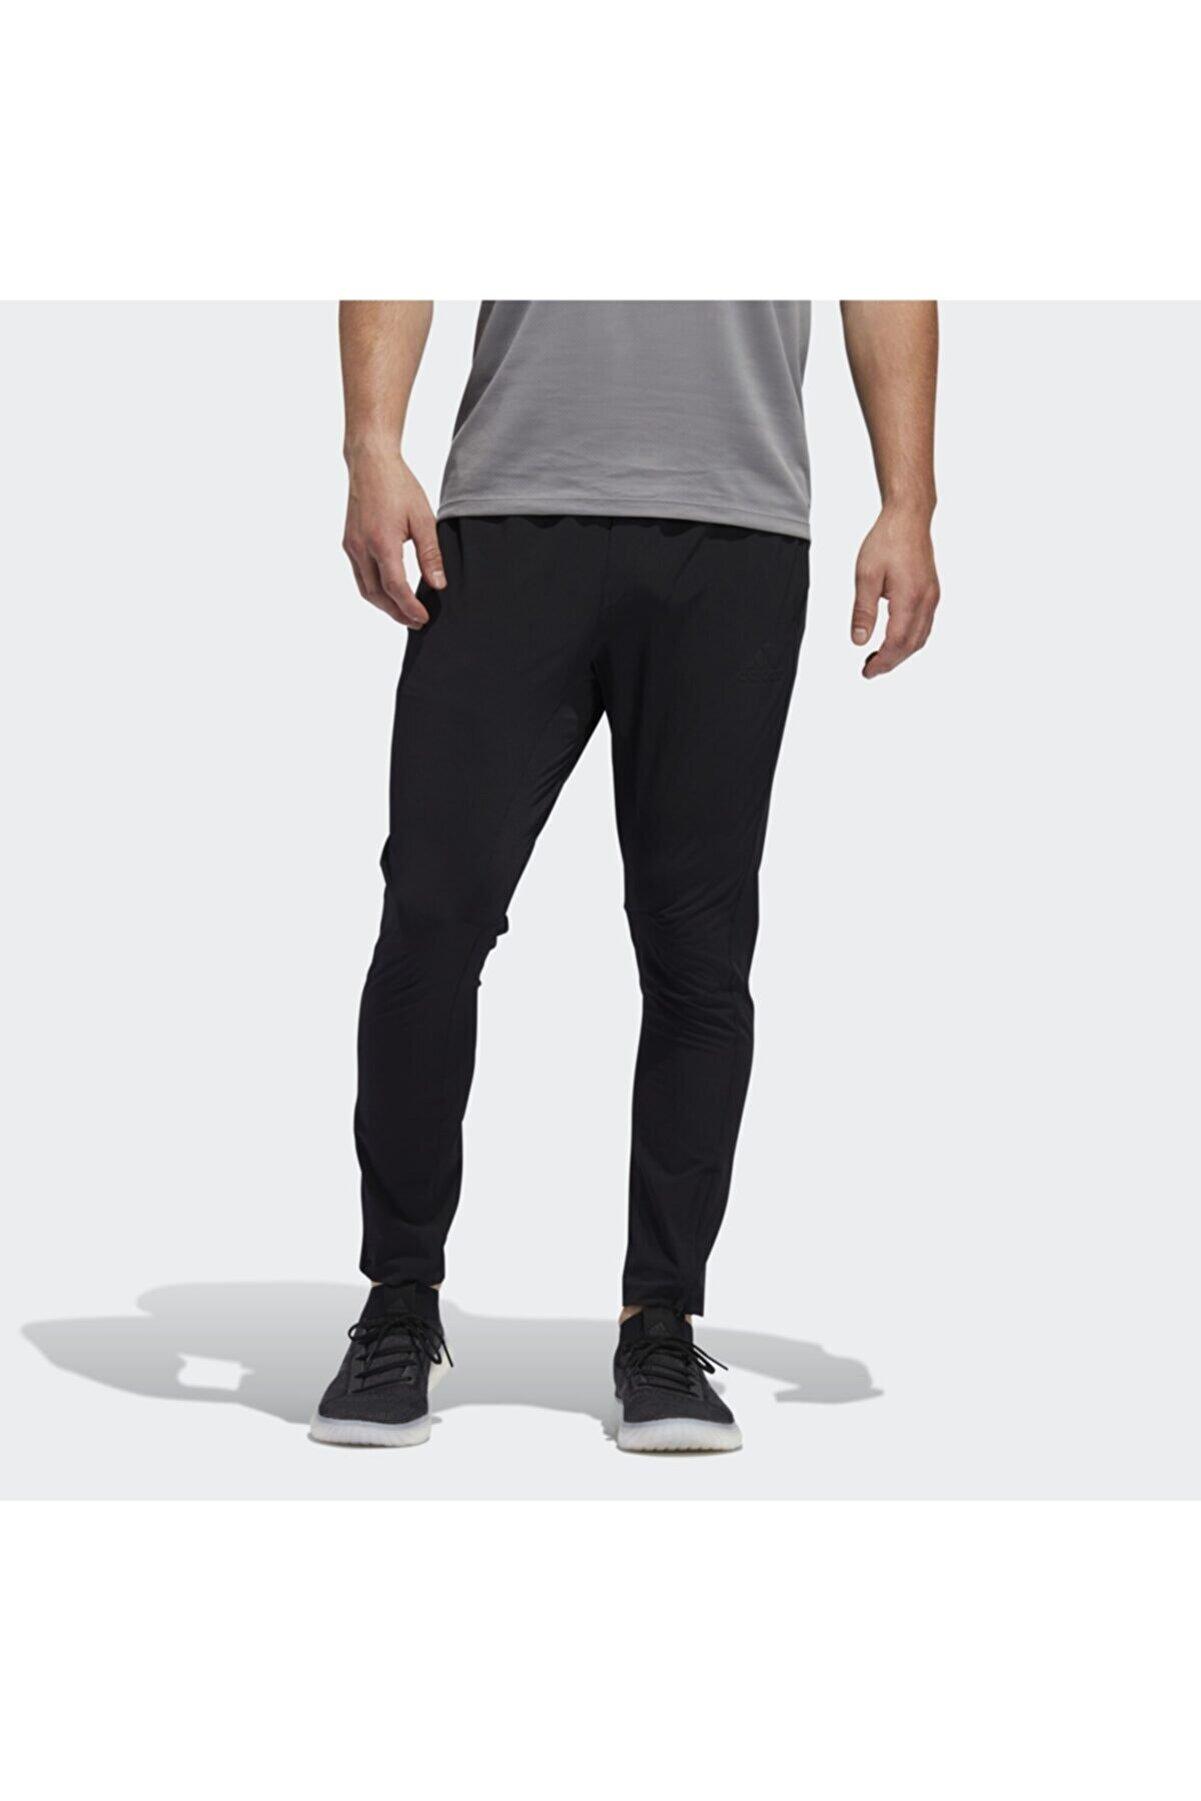 adidas Erkek Siyah Eşofman Altı